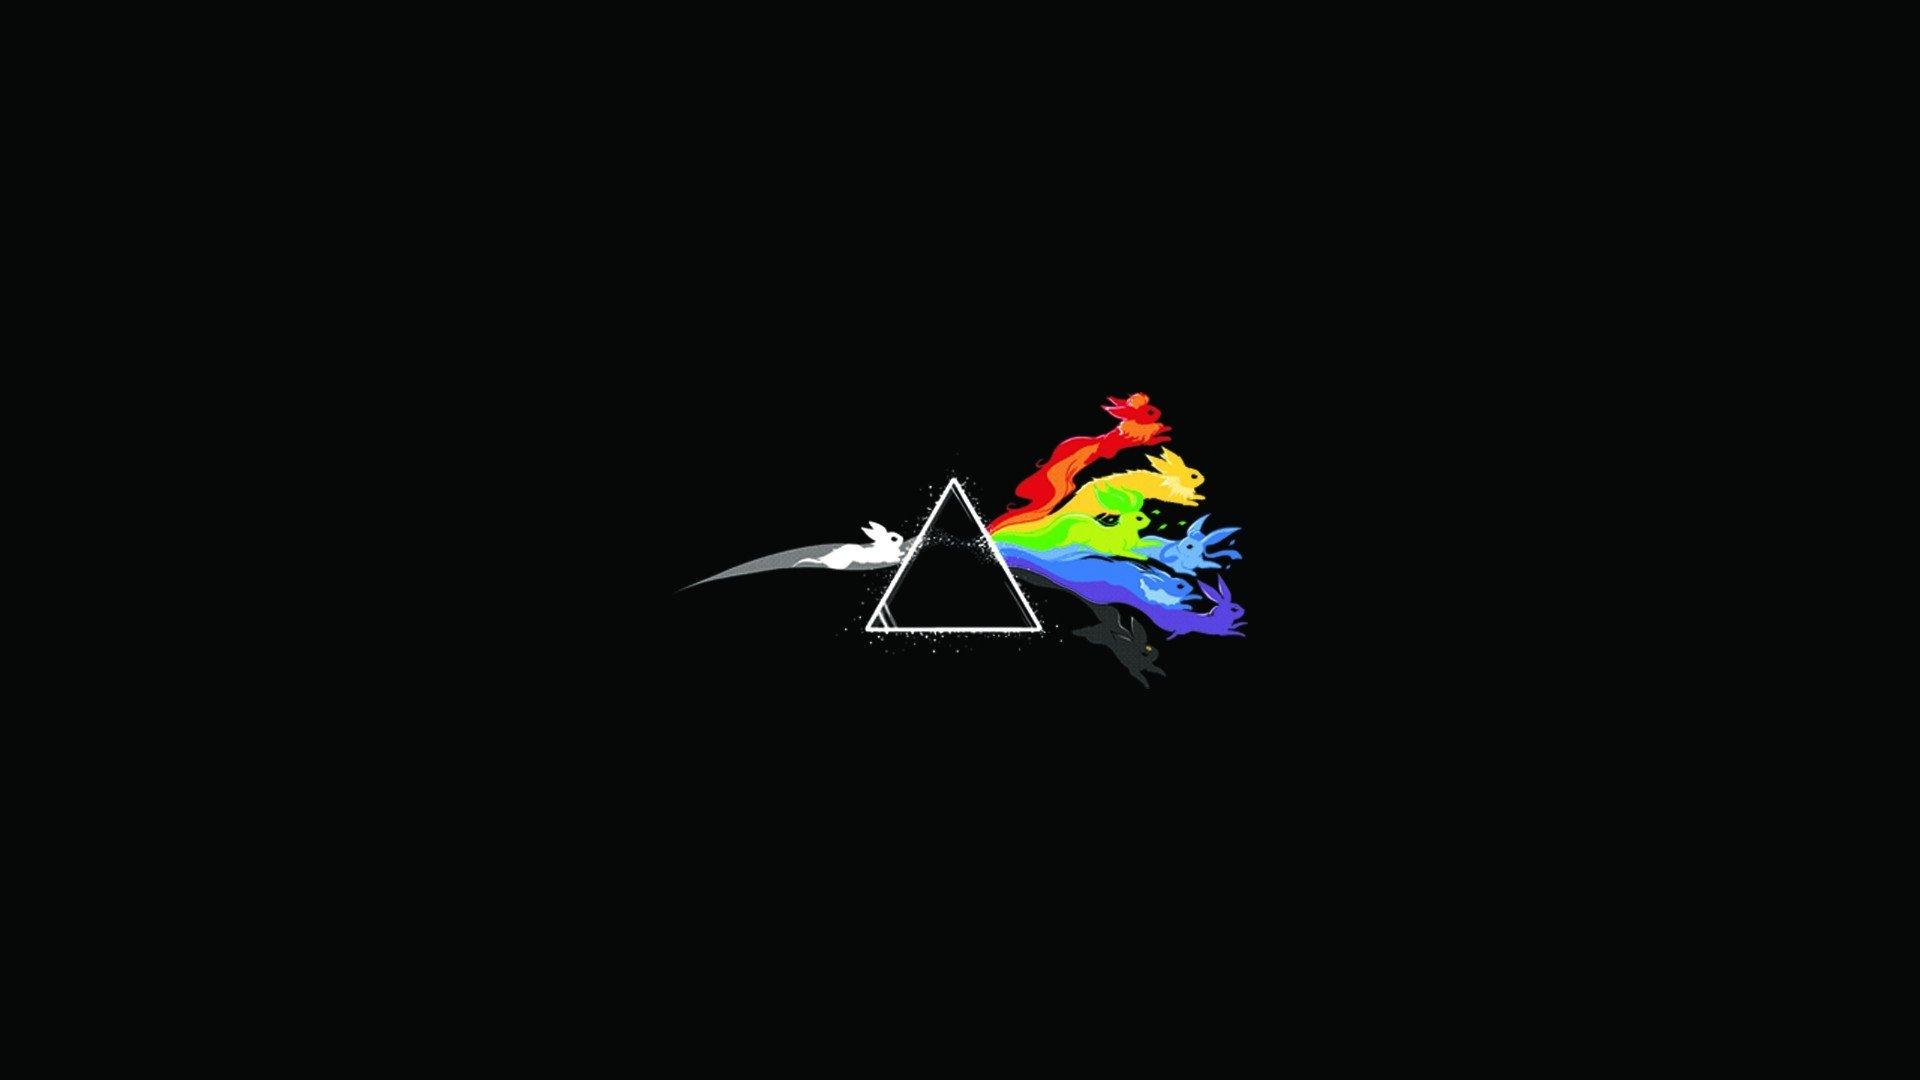 Gravity Falls Phone Wallpaper Hd Pok 233 Mon Pink Floyd The Dark Side Of The Moon Hd